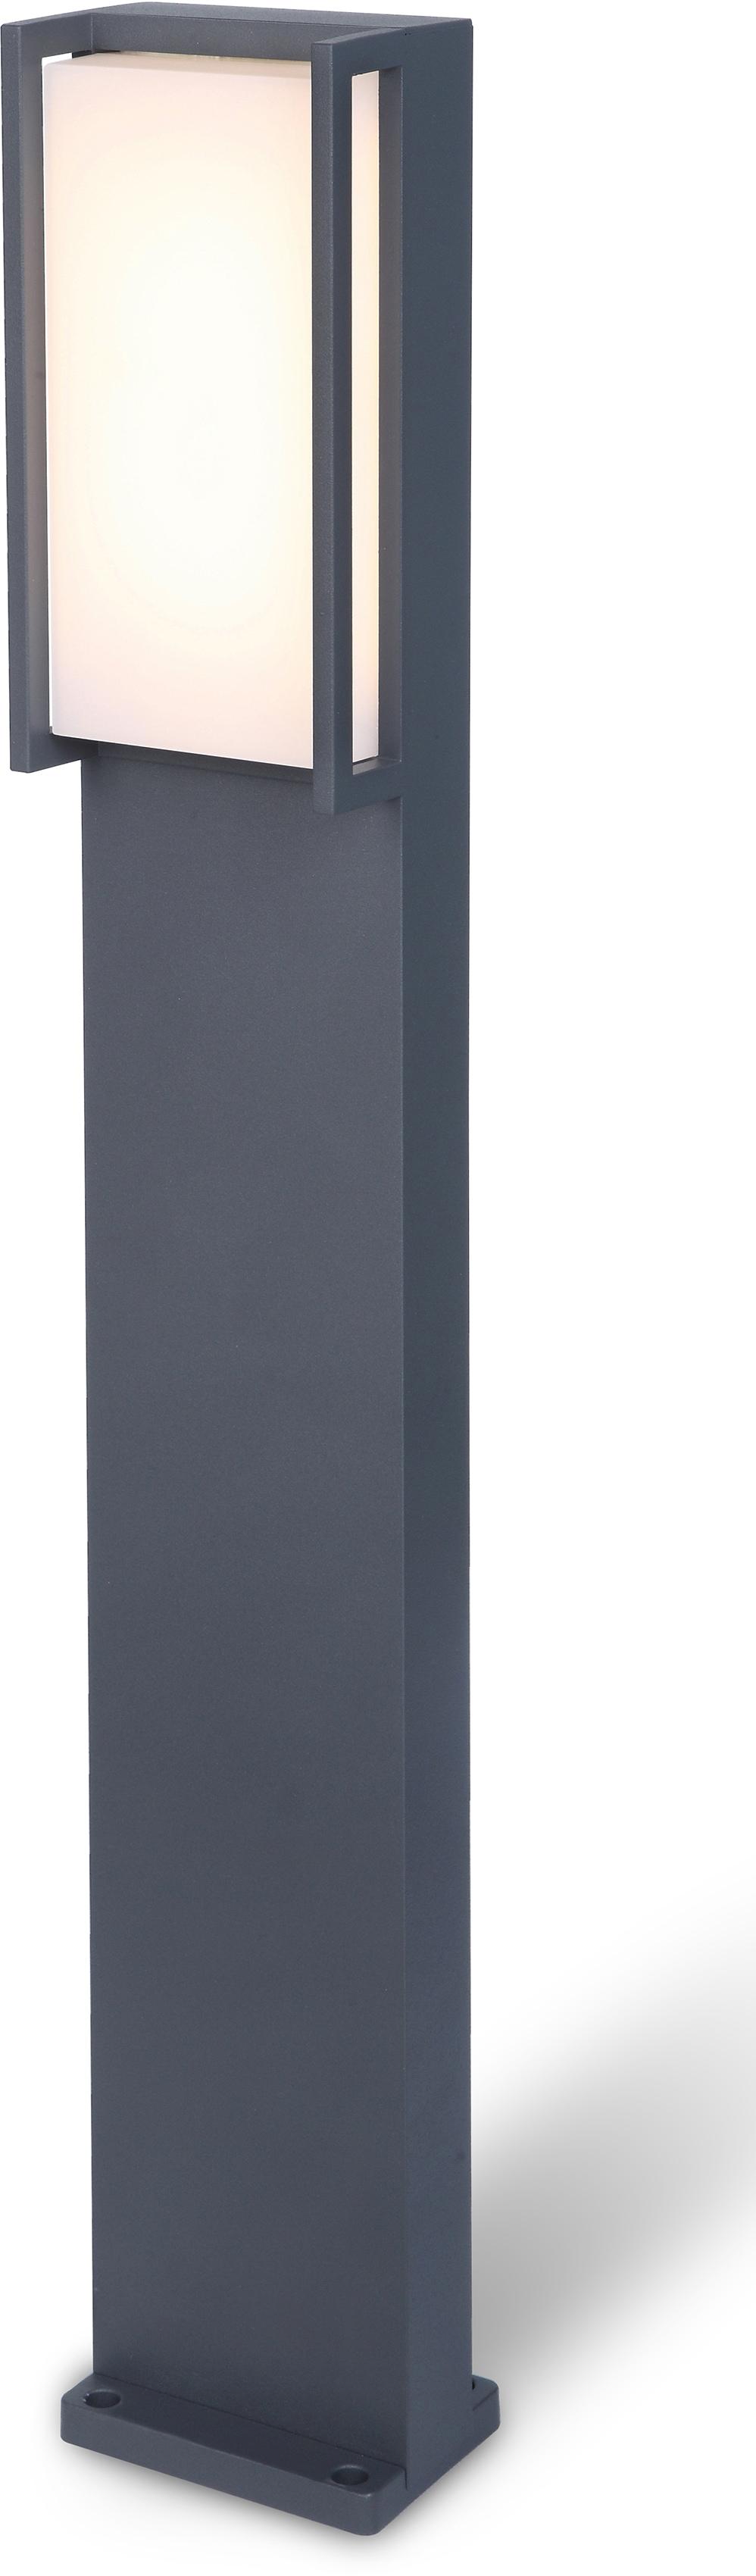 LUTEC LED Pollerleuchte Qubo 7193001118, LED-Modul, 1 St., Warmweiß